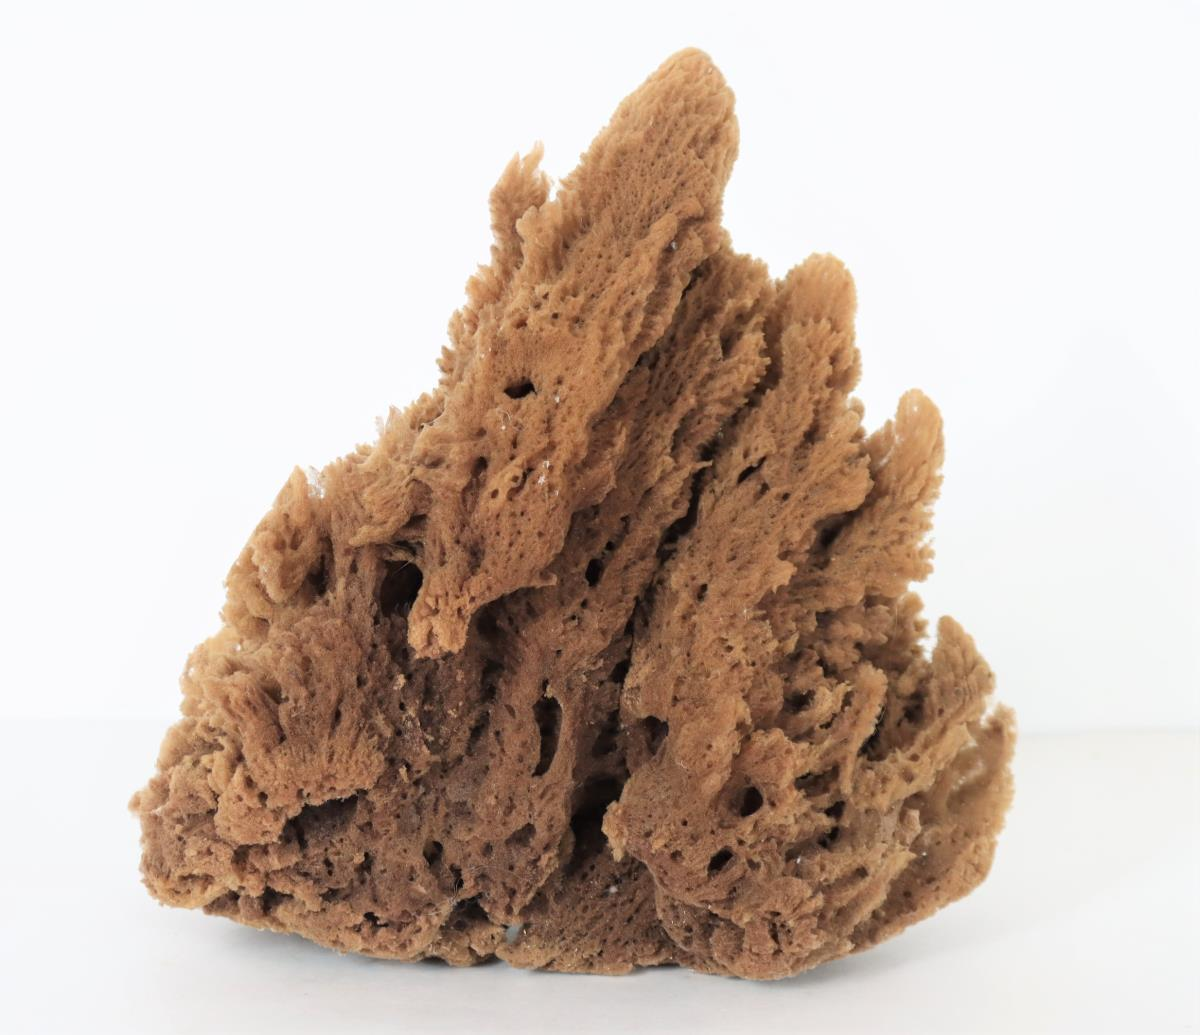 Large Natural Sea Sponge - Image 2 of 4